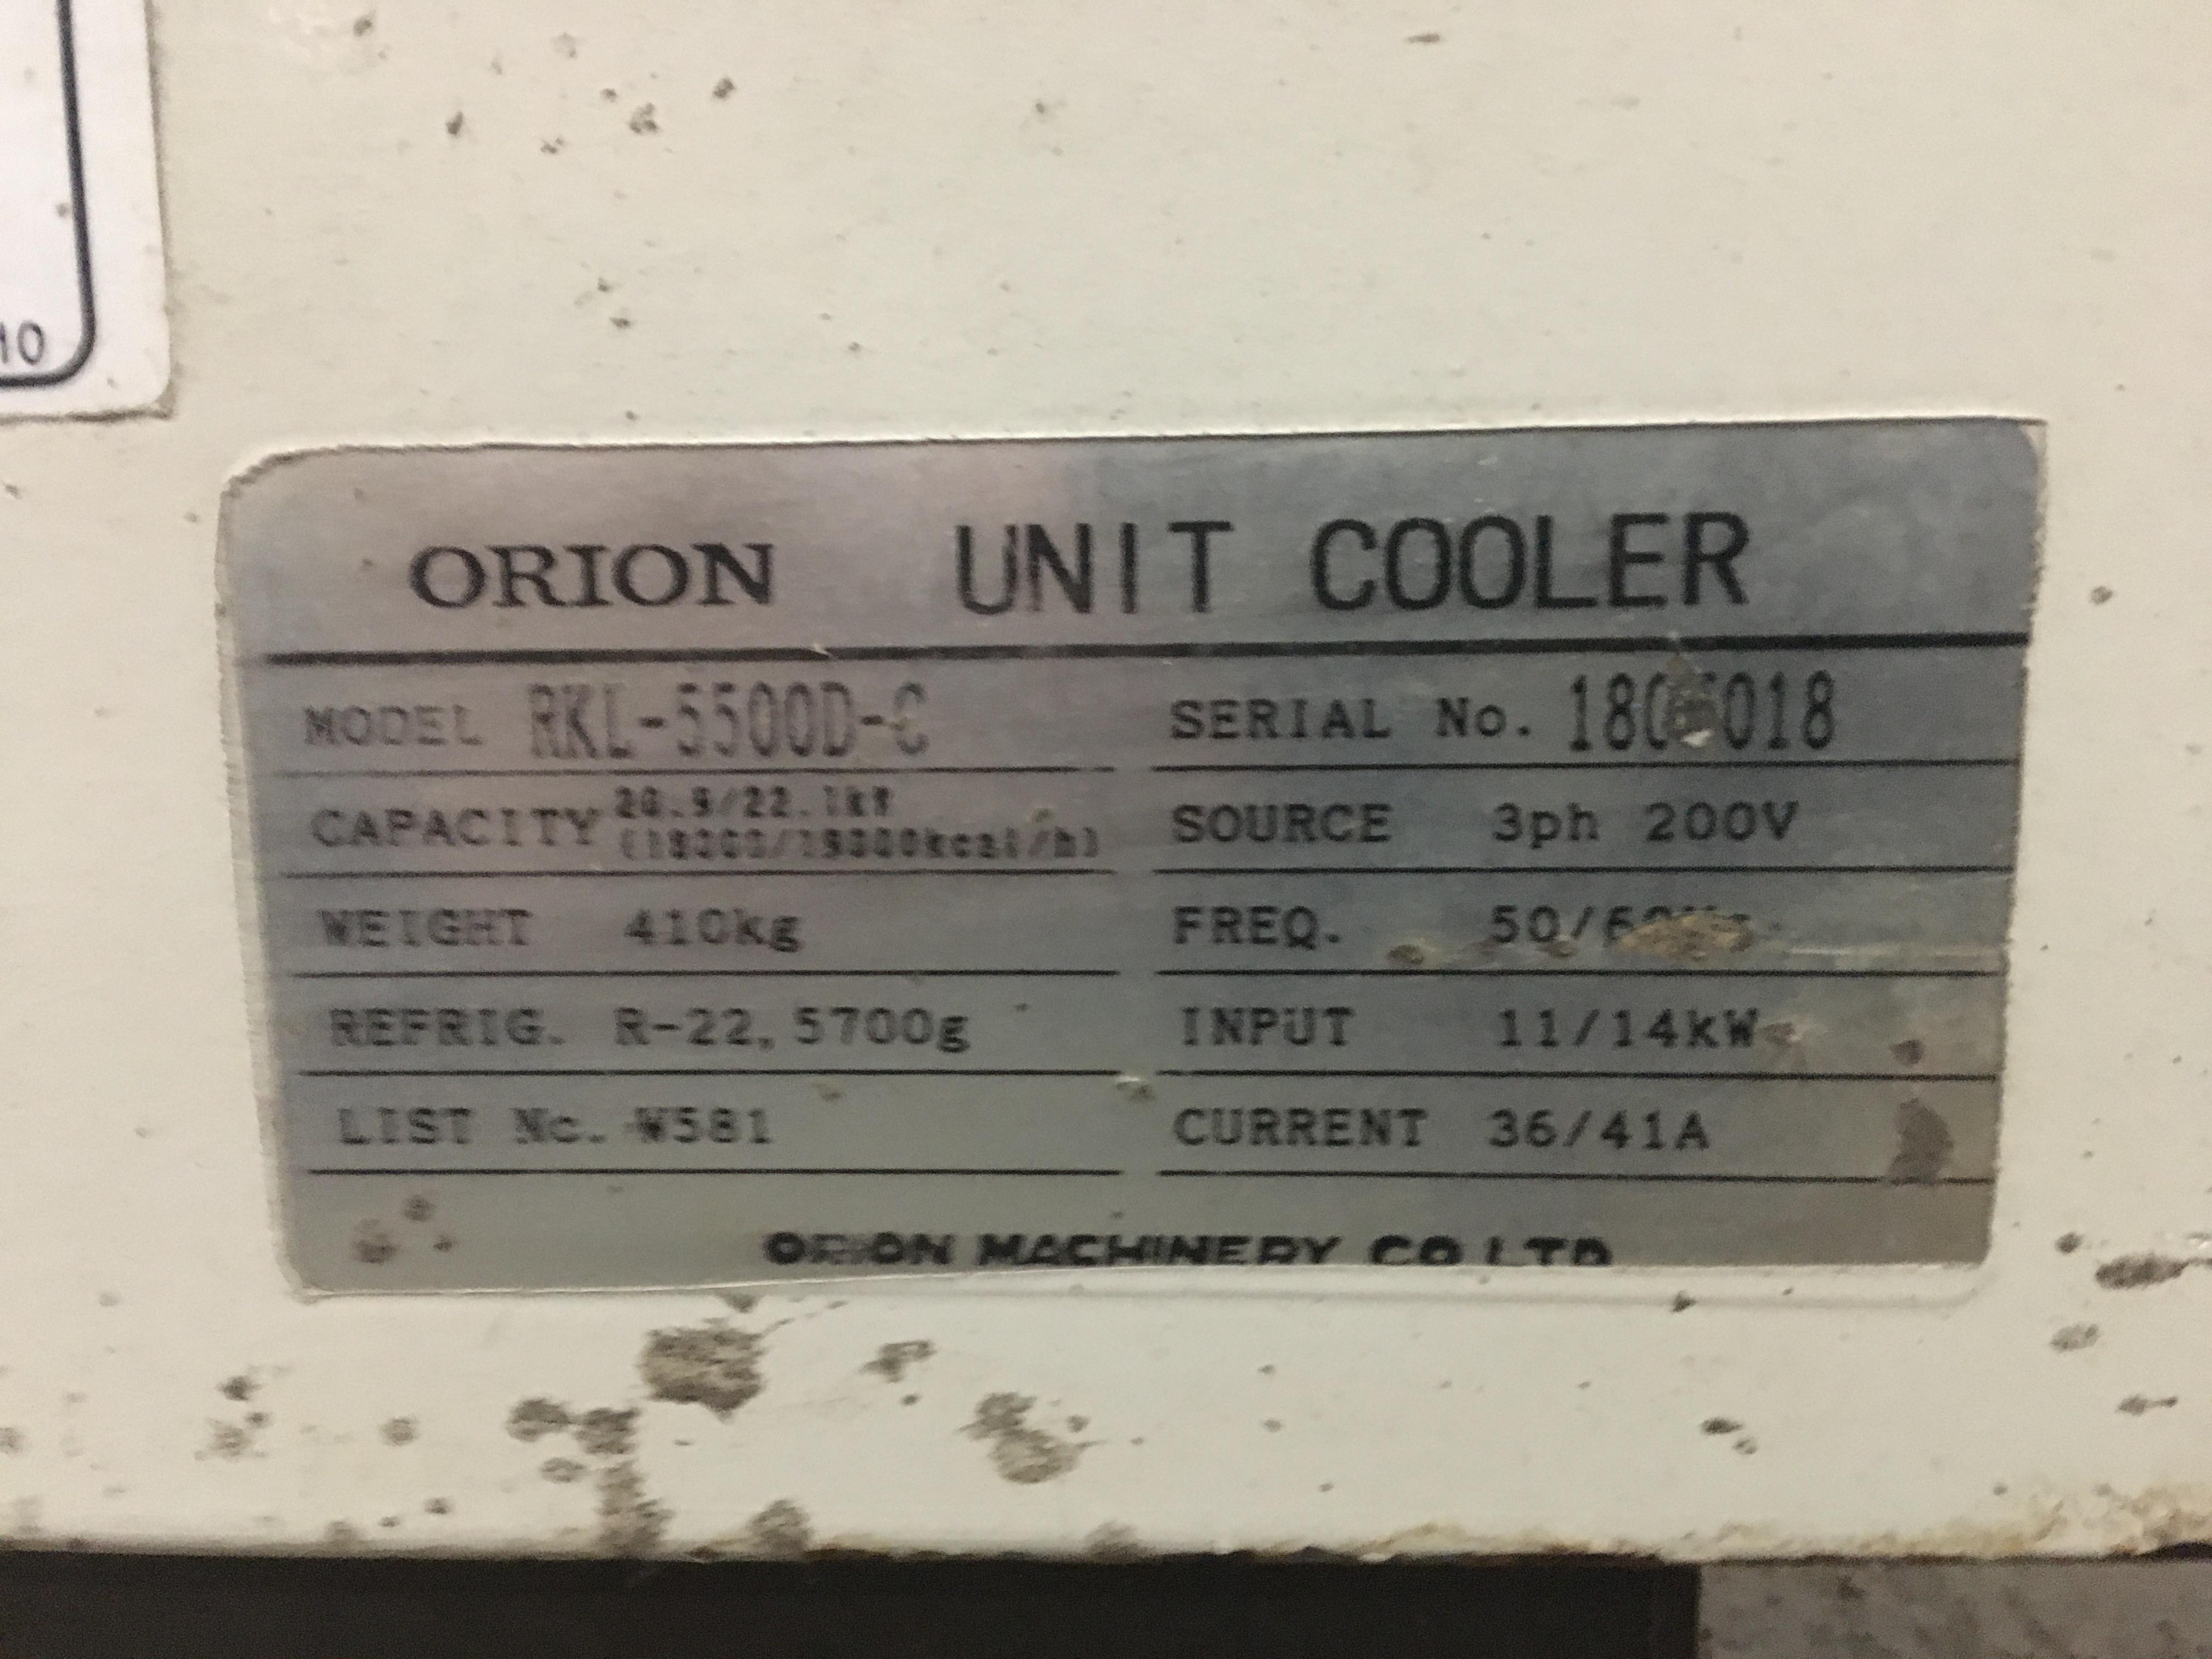 "Mazak Model X-48 Champion Co2 Laser, 1500 Watt, 49"" x 98"" Capacity, Orion Chiller, 55,000 Hours - Image 8 of 10"